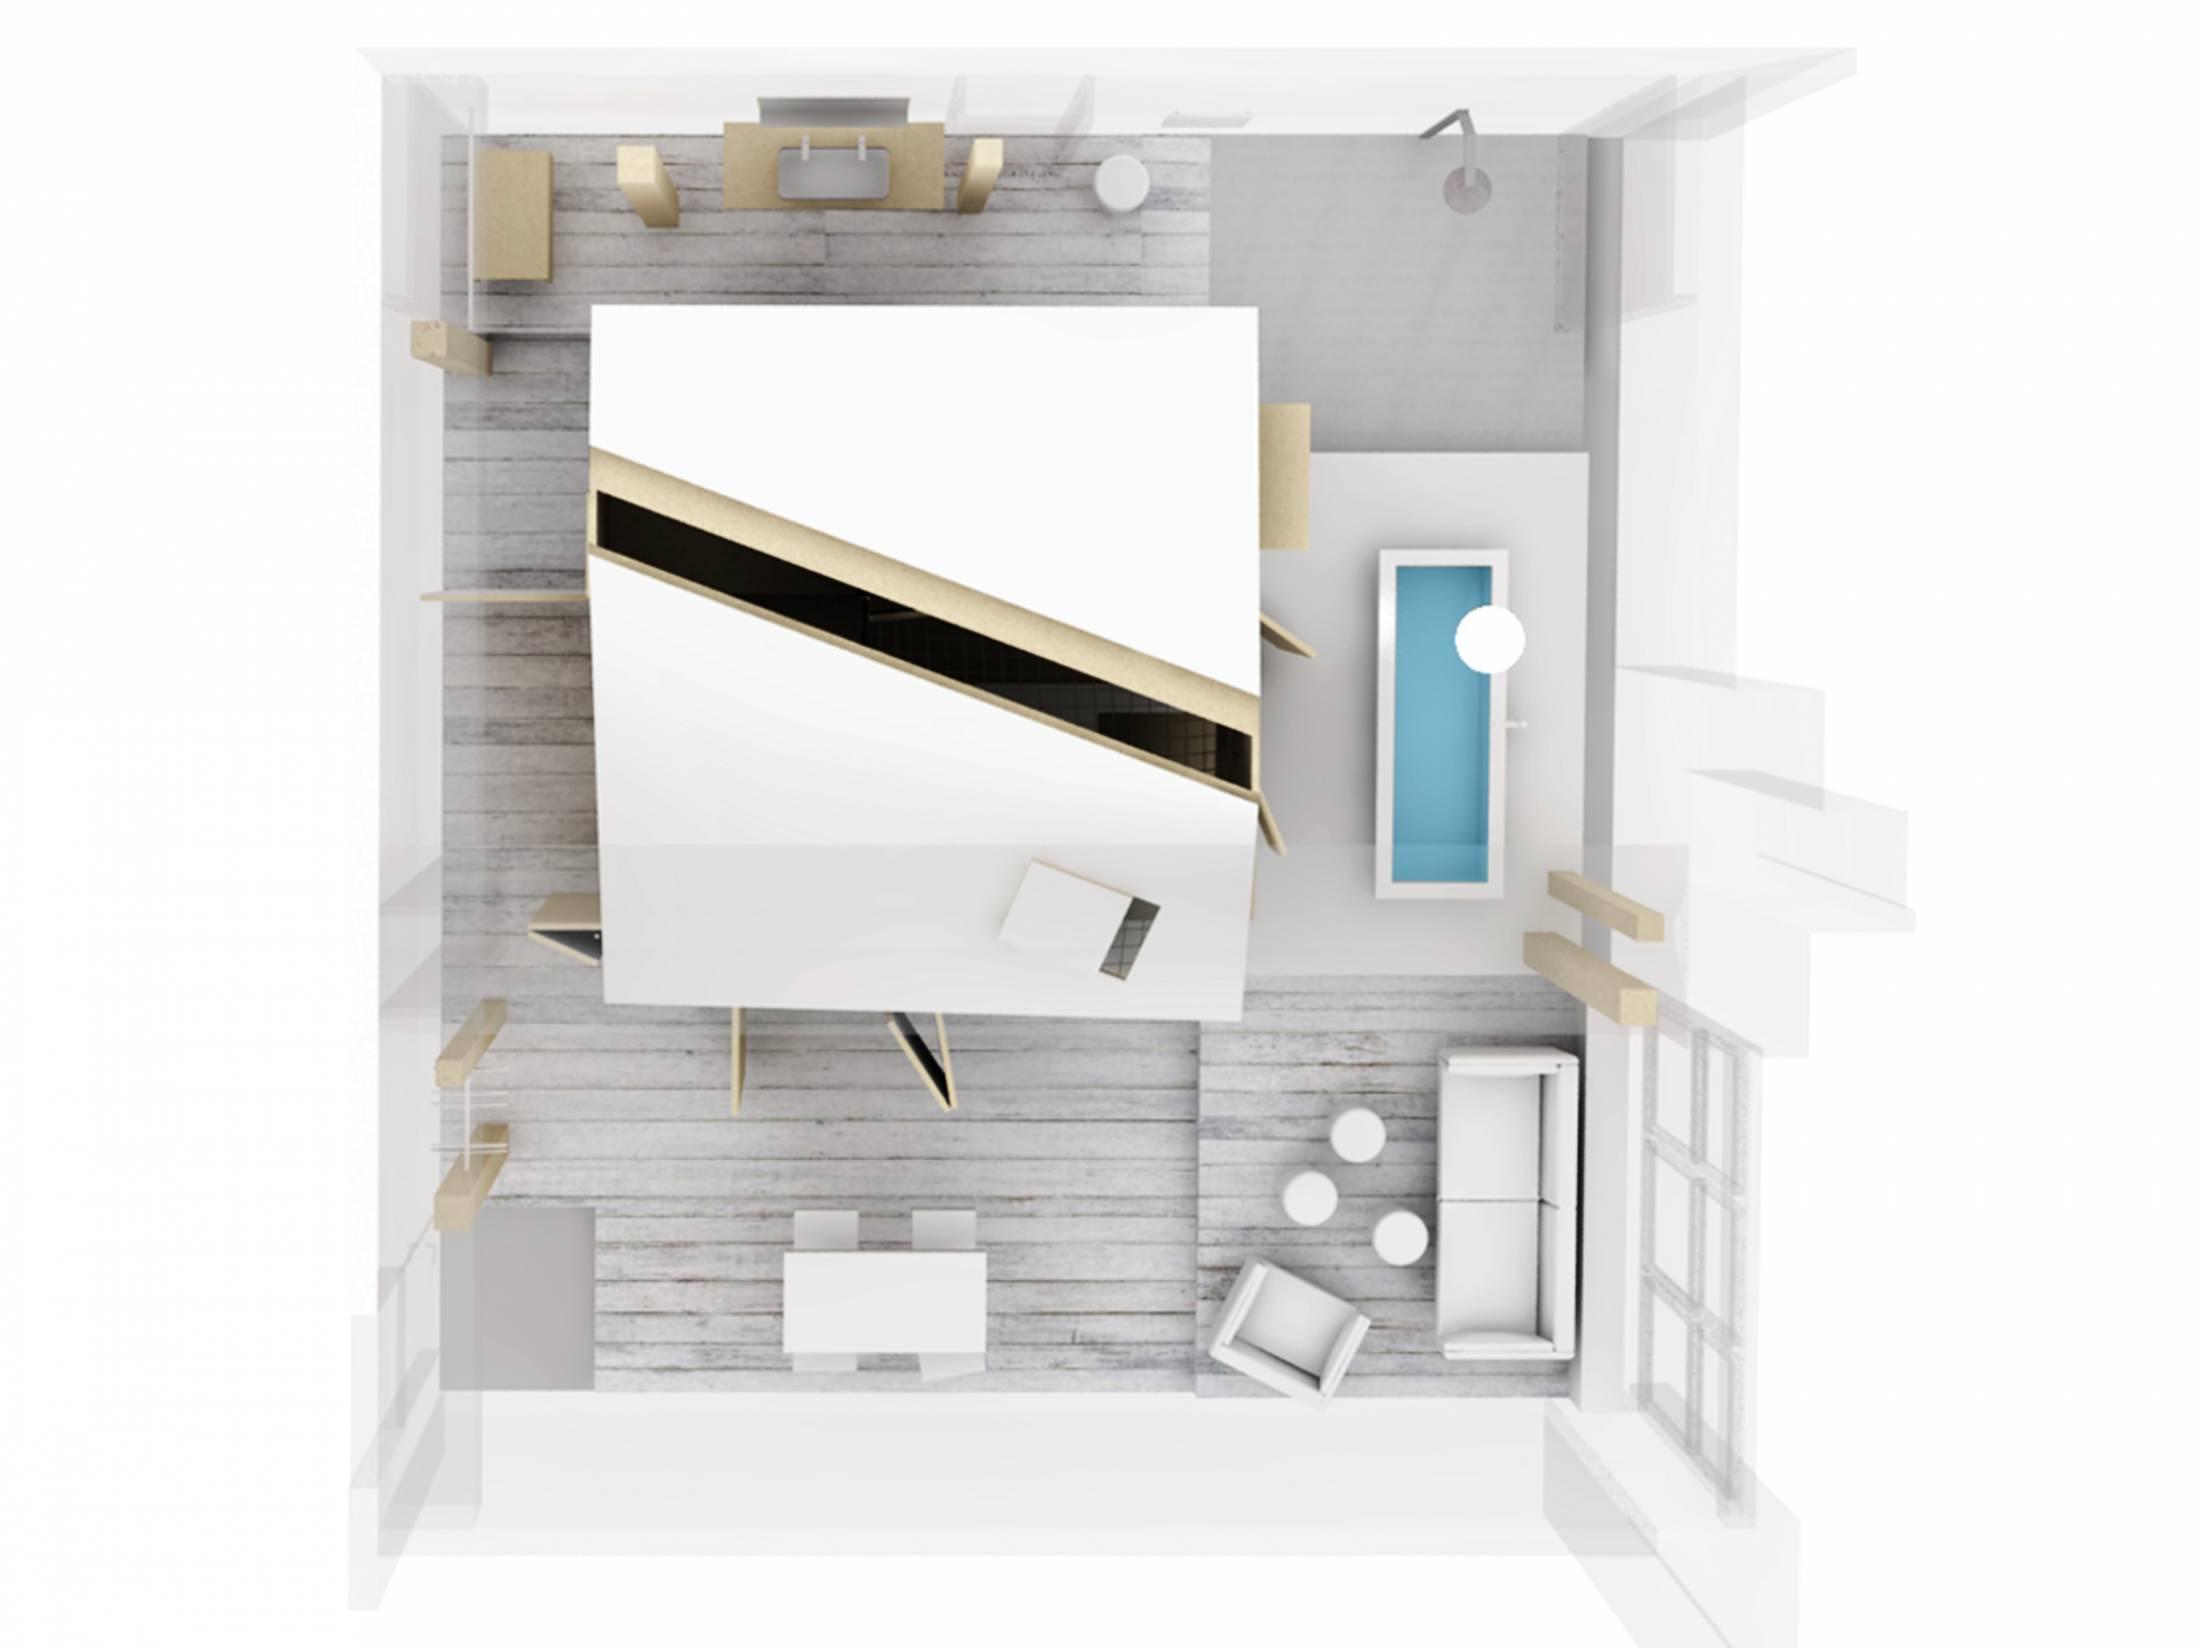 Room-304_Sigurd-Larsen_Michelberger-Hotel_Architecture-Danish-design-berlin_top-1100x824@2x.jpg